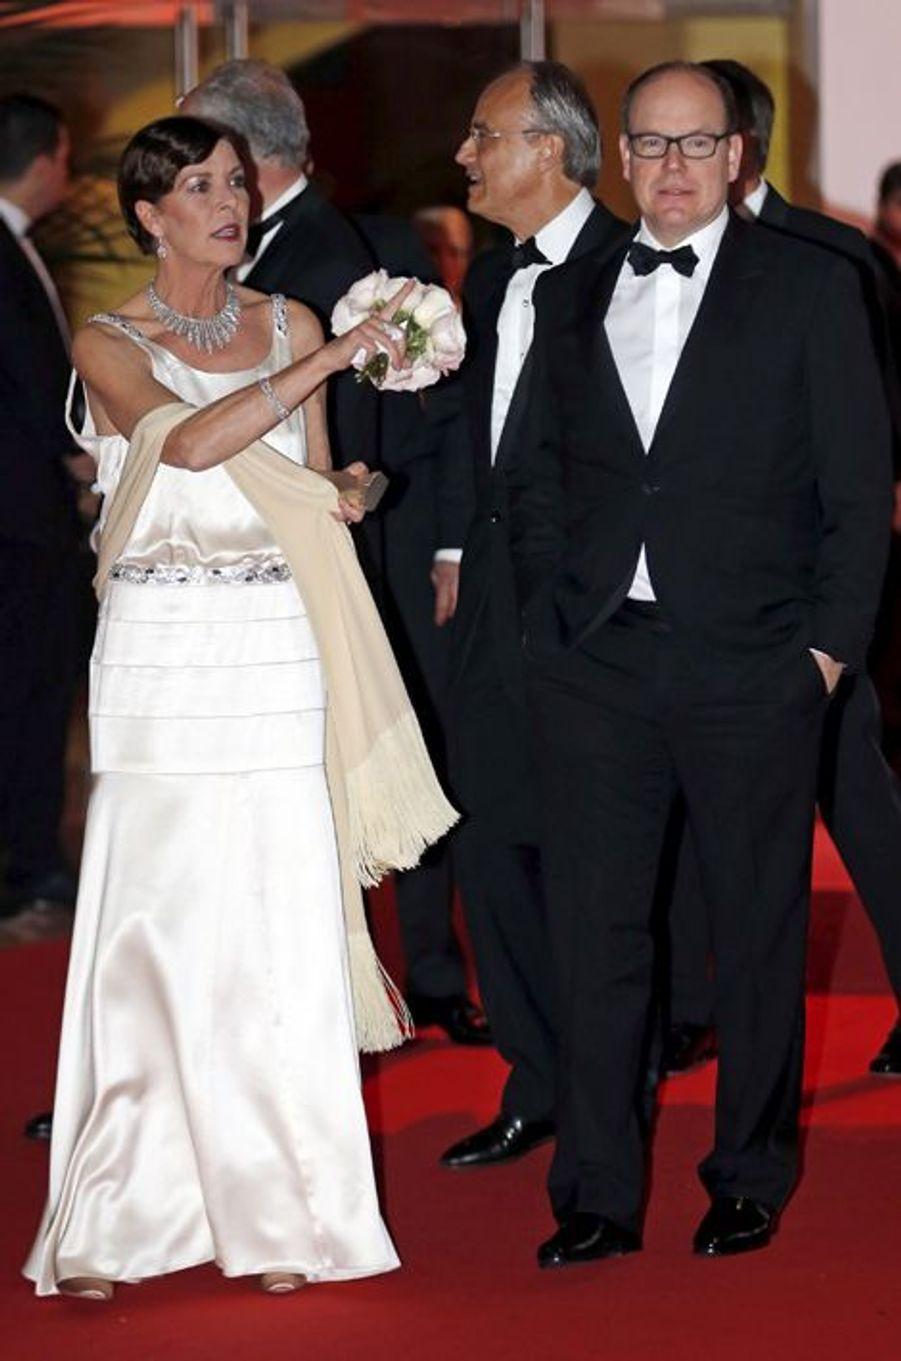 La princesse Caroline de Monaco au bal de la Rose 2015, avec le prince Albert II